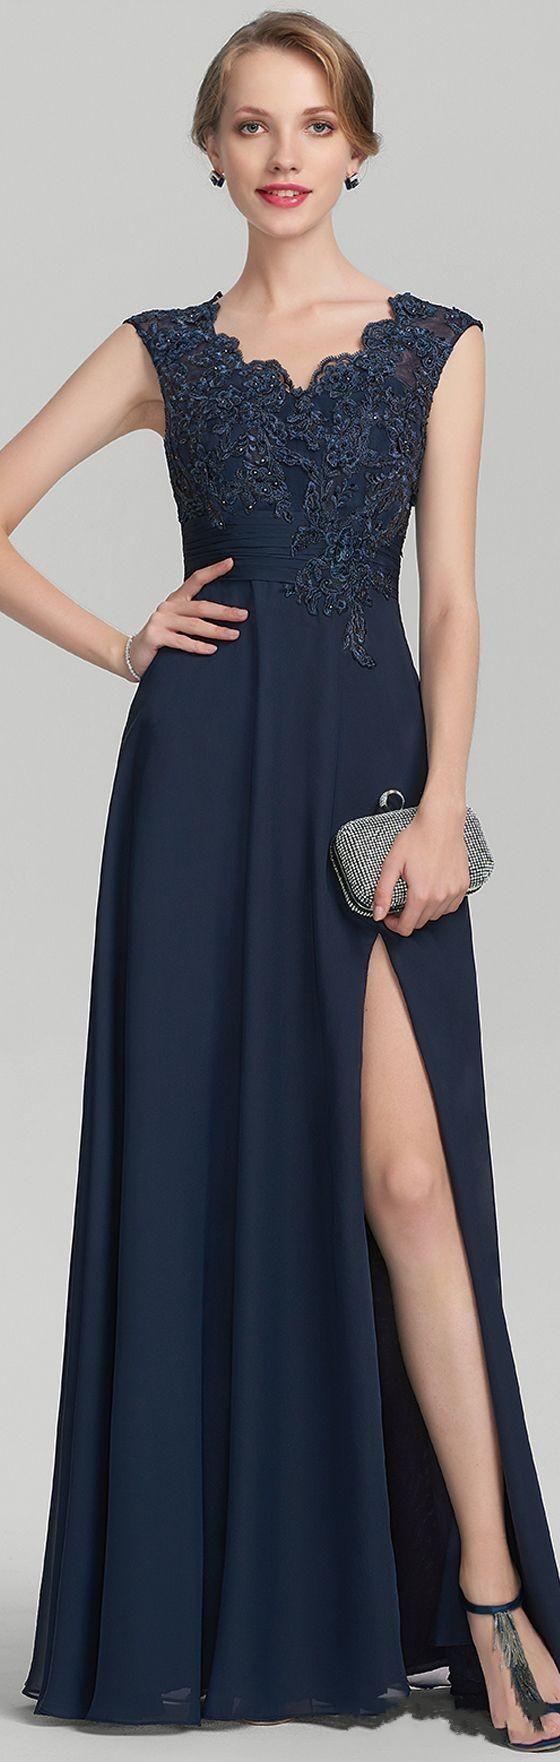 V neck navy blue lace mother of the bride dress plus size high slit